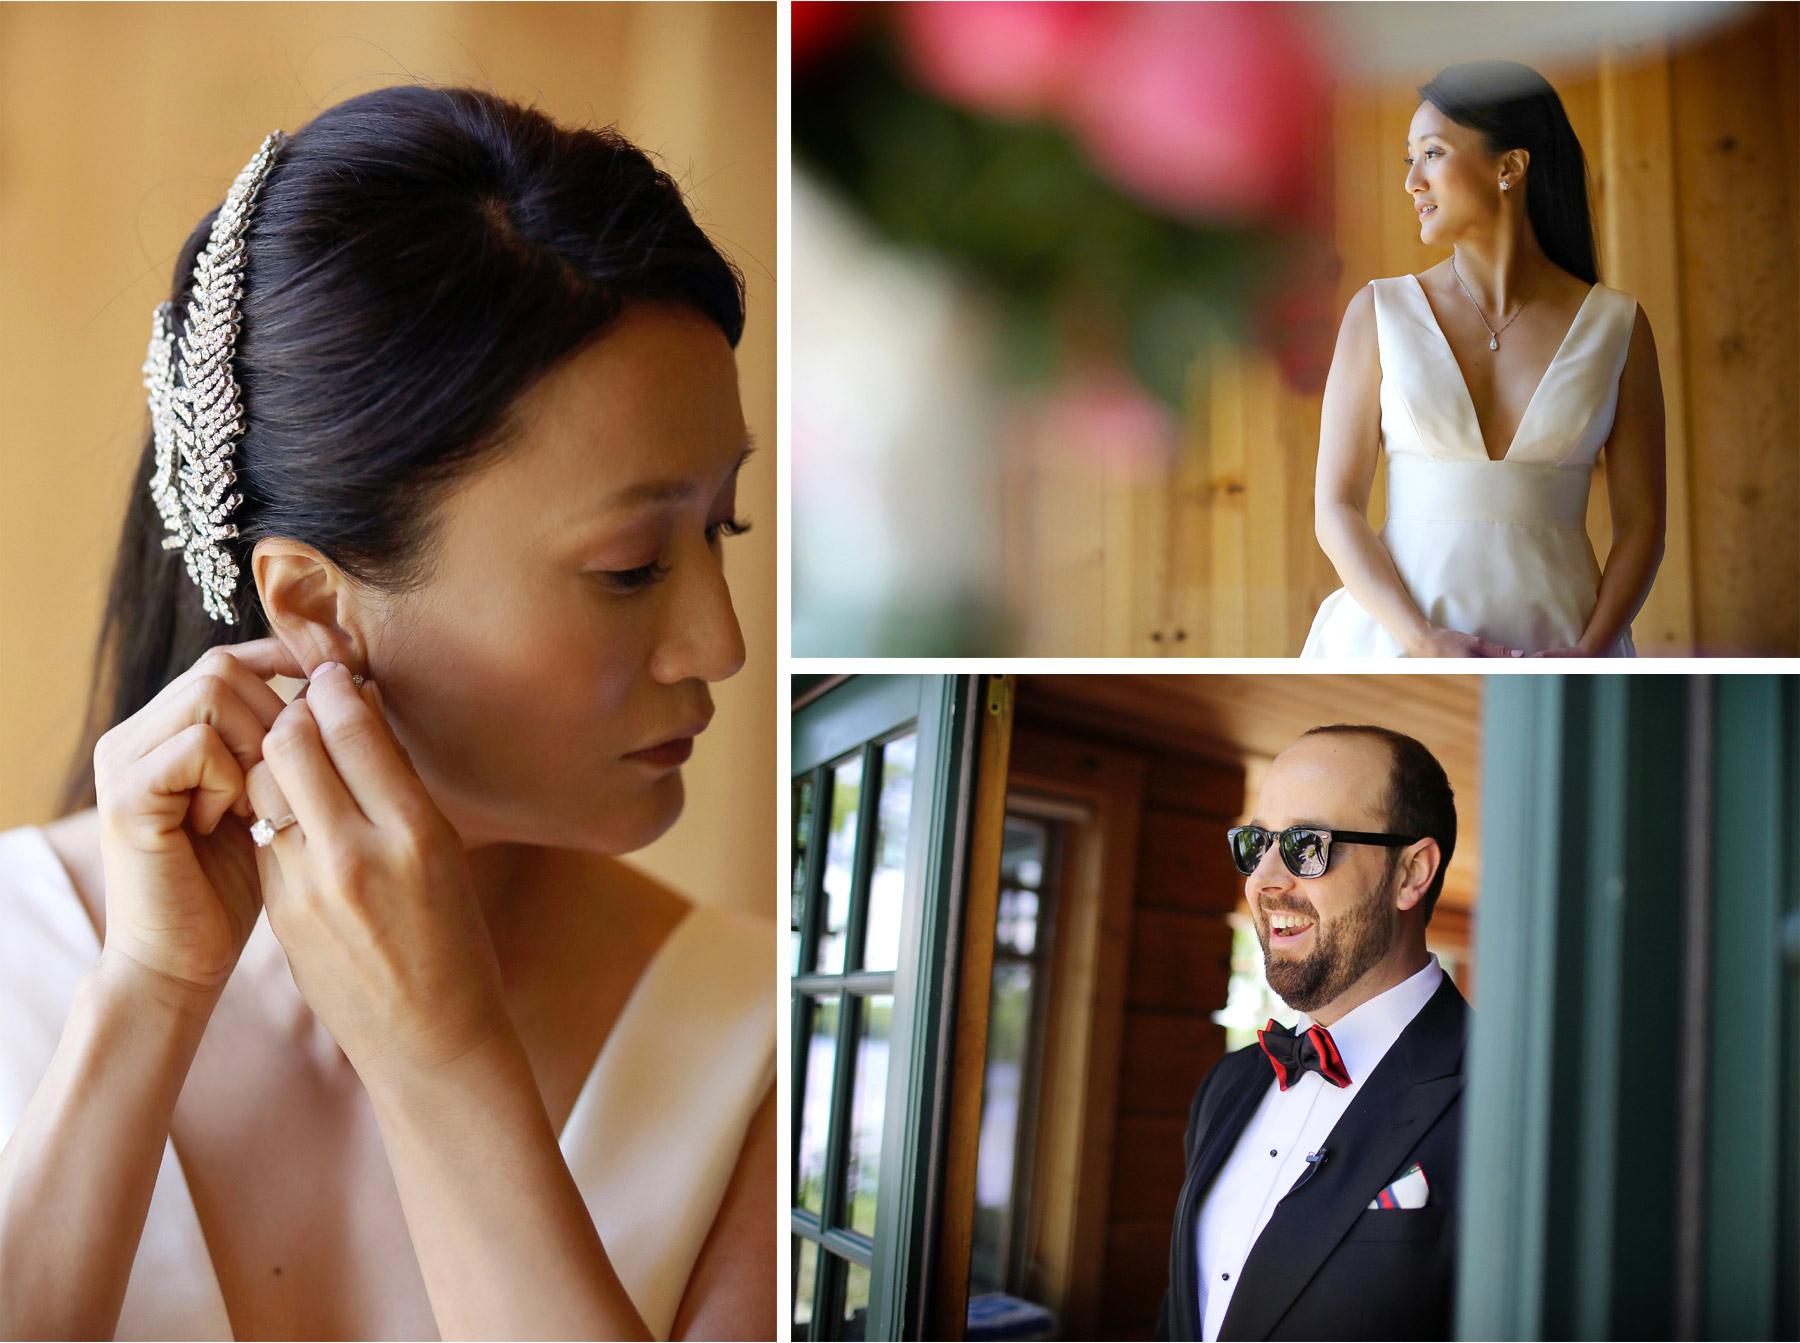 07-Vick-Photography-Wedding-Stouts-Island-Lodge-Wisconsin-Summer-Dress-Bride-Groom-Sunglasses-MiJa-and-Lucius.jpg